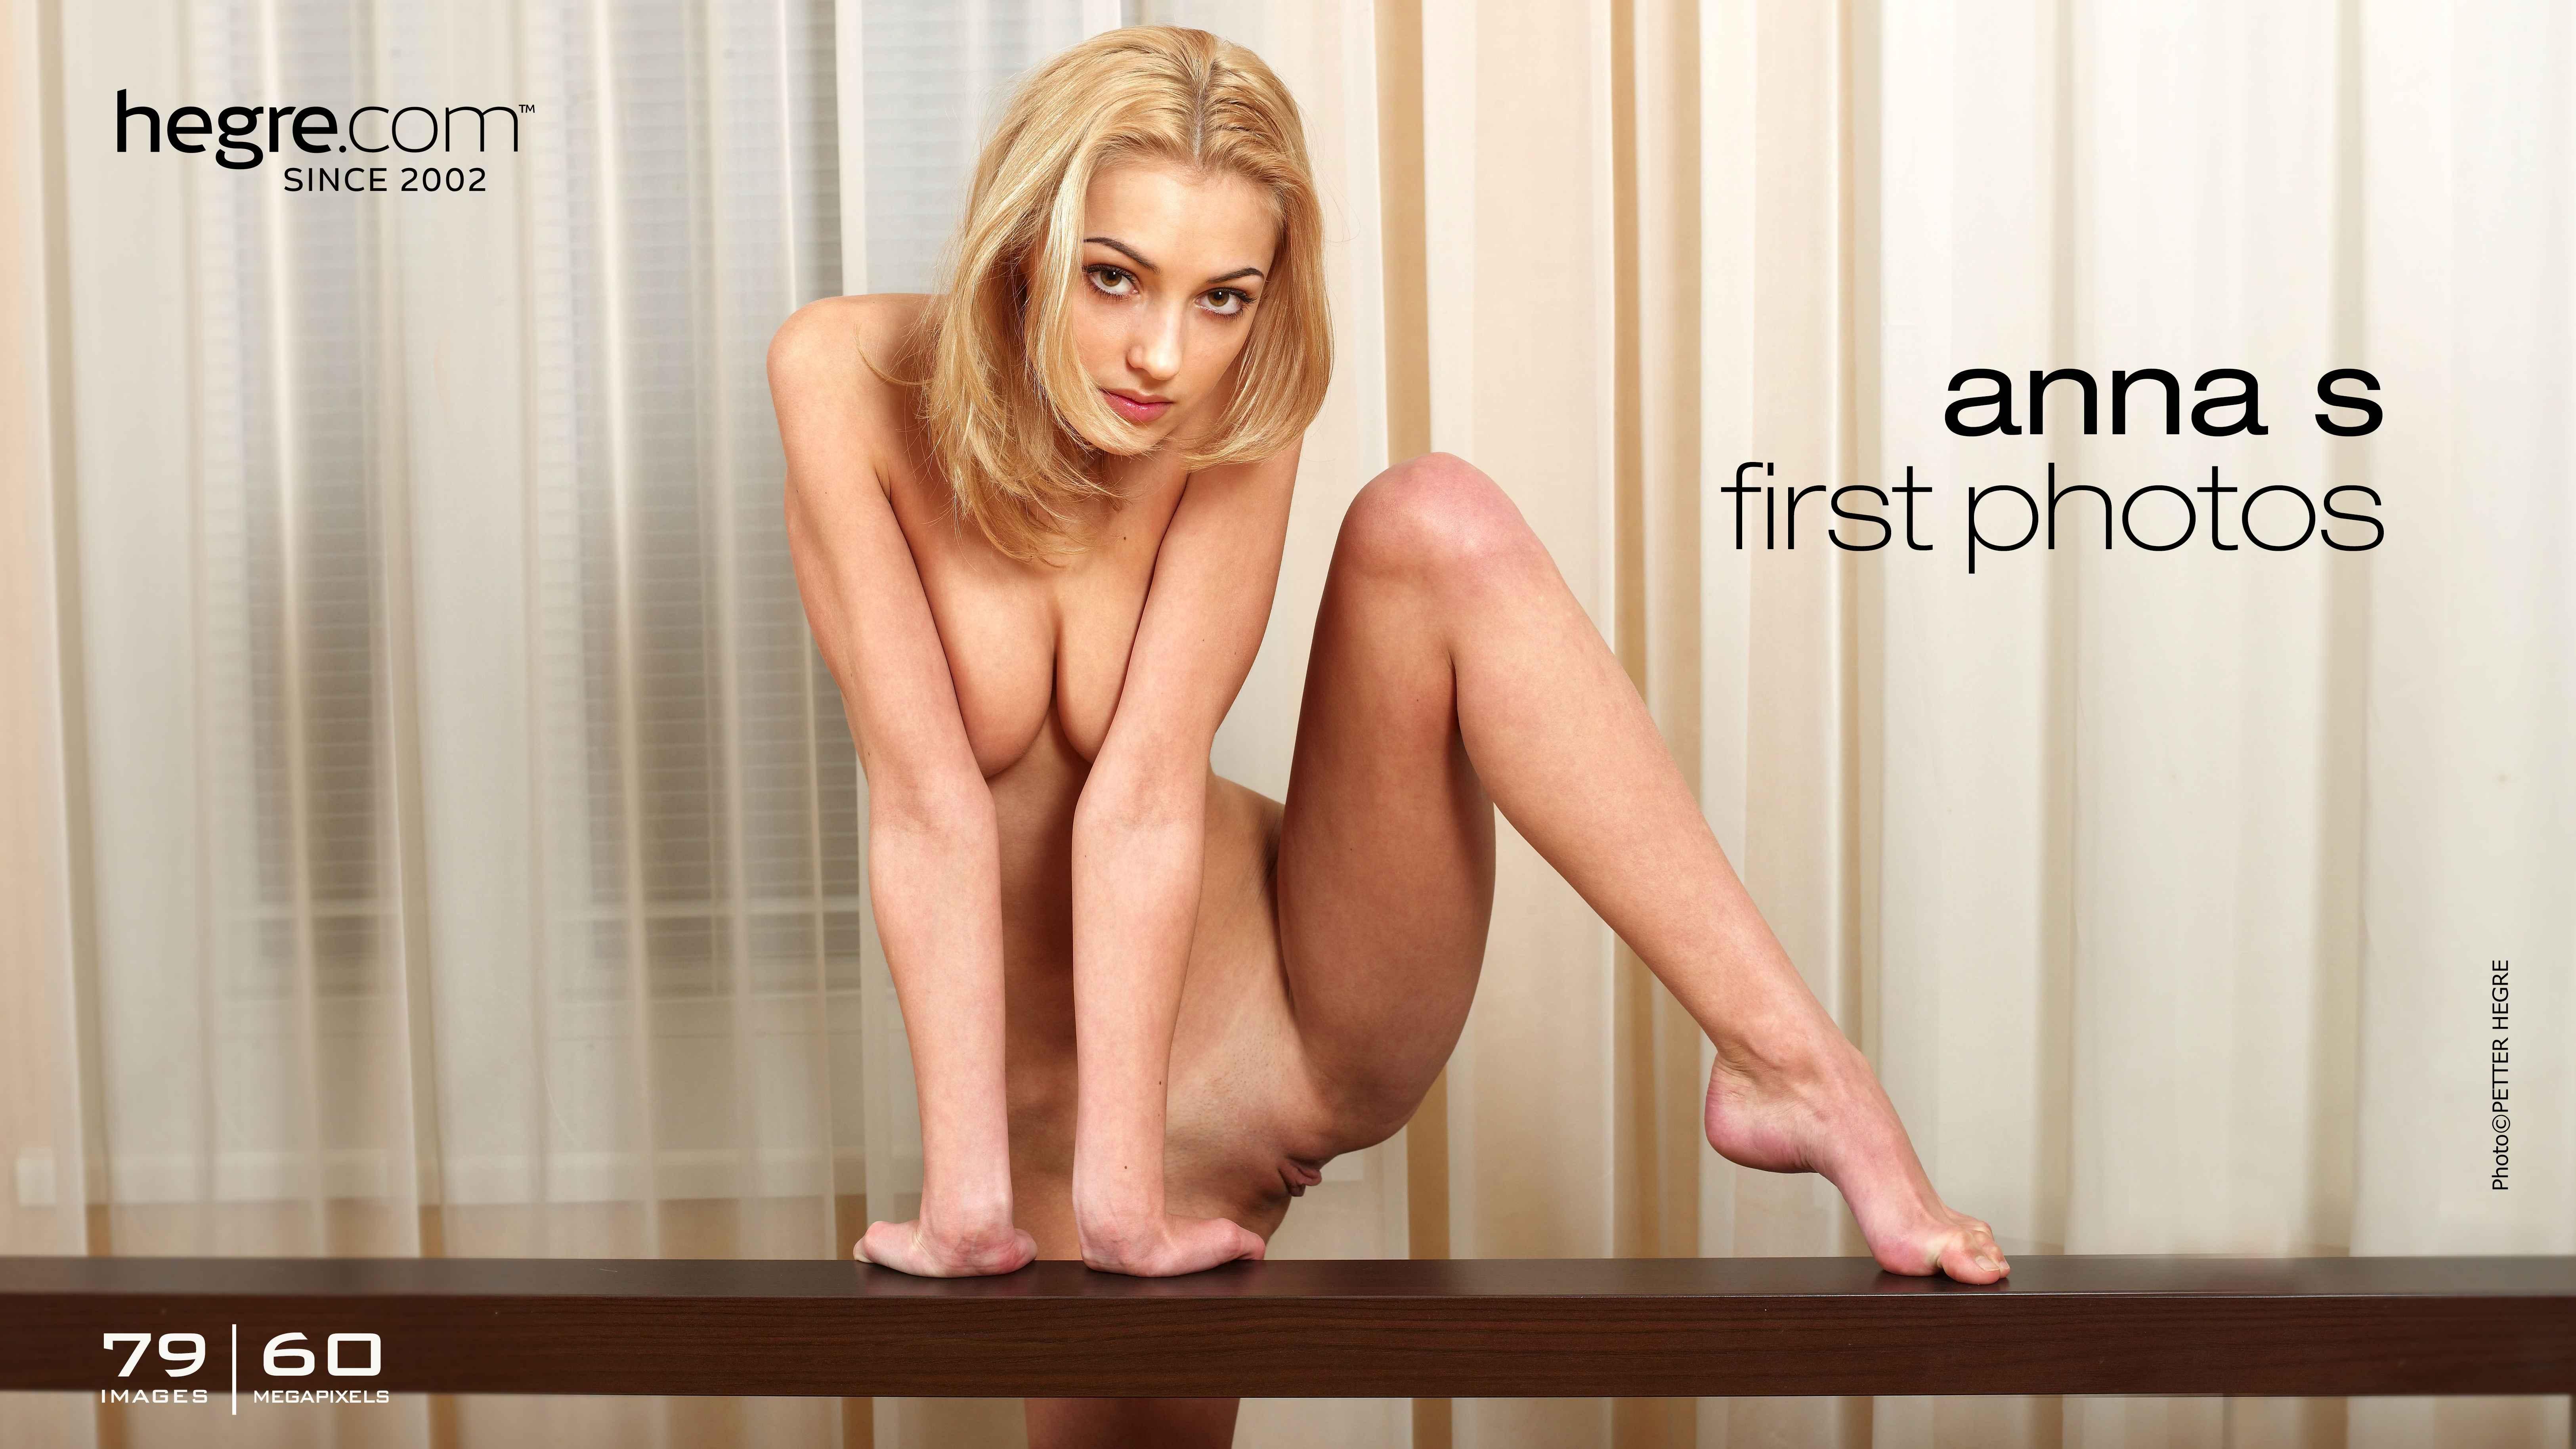 Anna S first photos